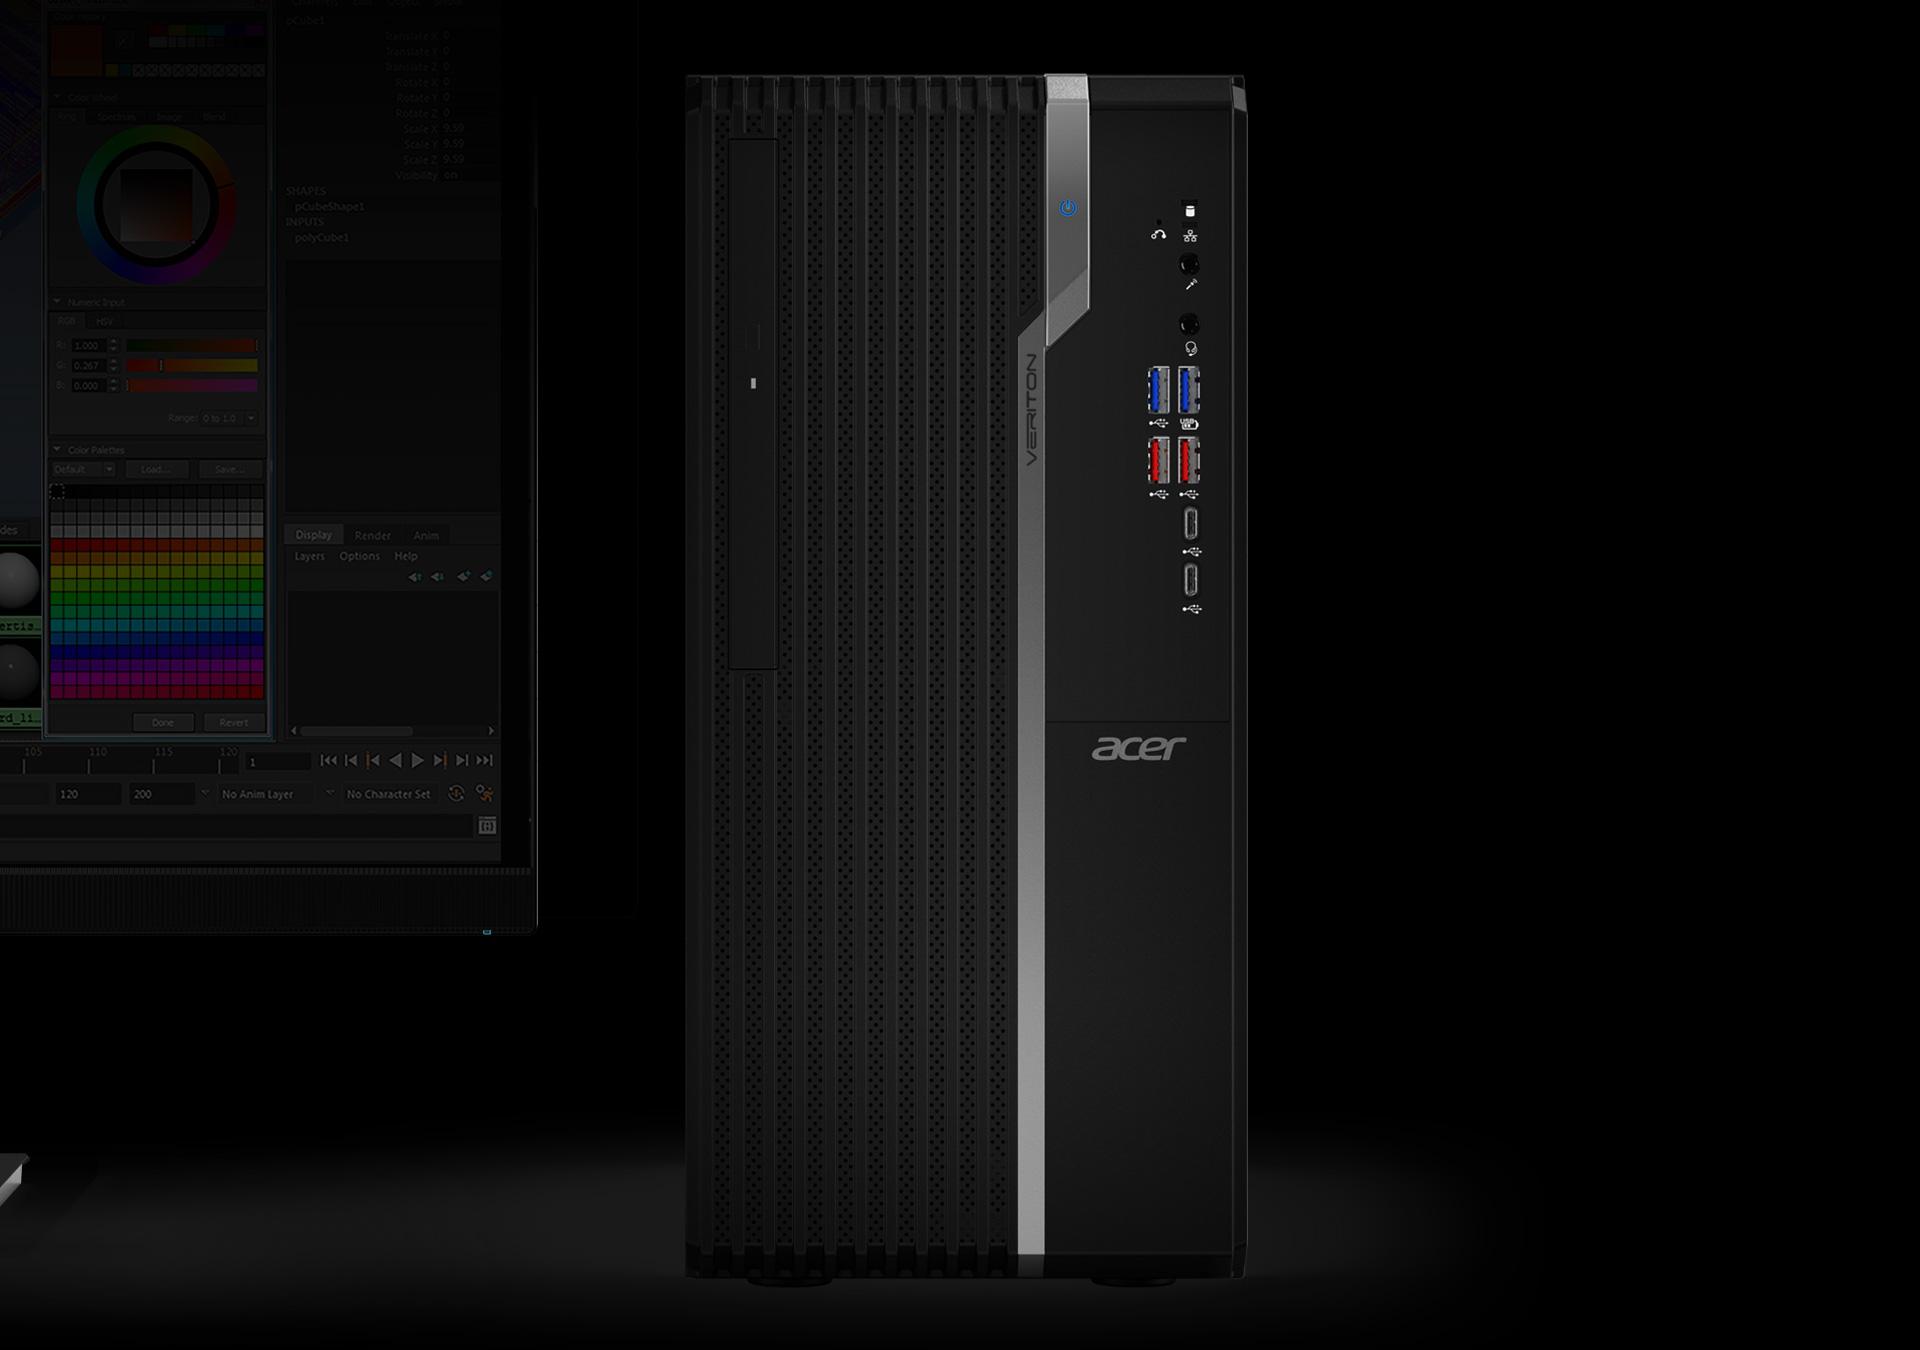 Veriton S ksp - overview features - Large